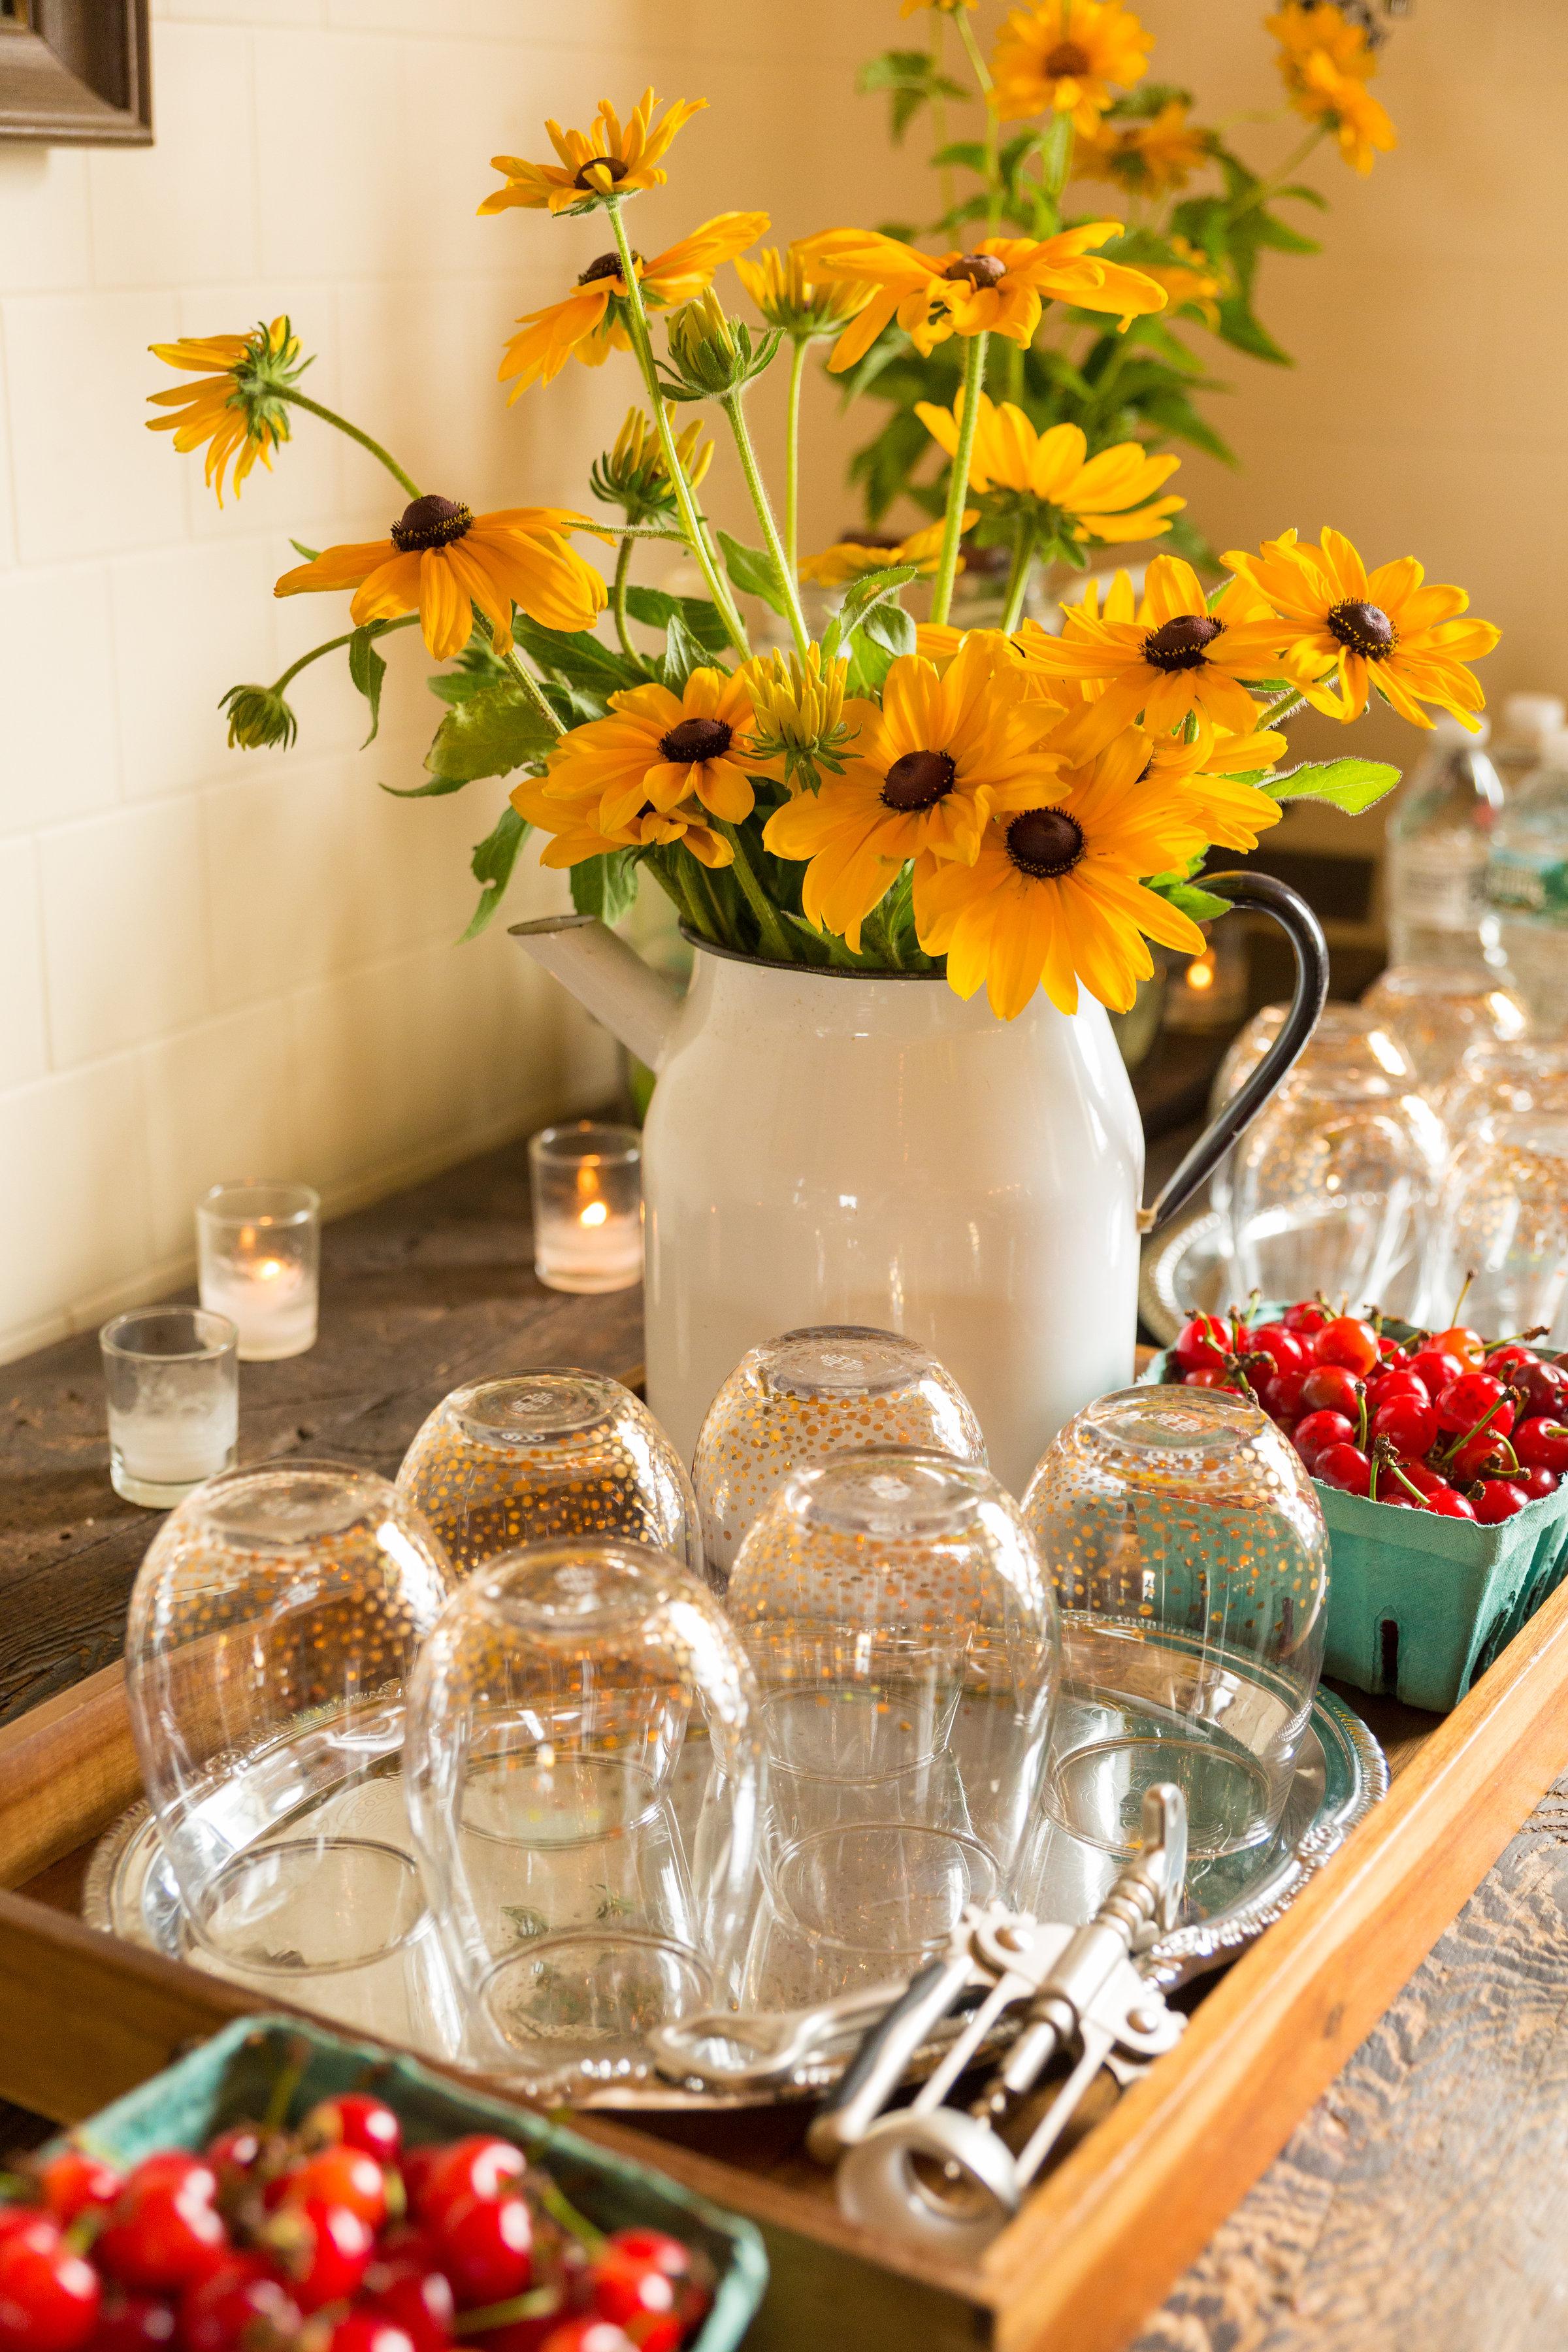 Danielle-Jeff-Farm-to-table-wedding-photography-love-story-studios-0037.jpg